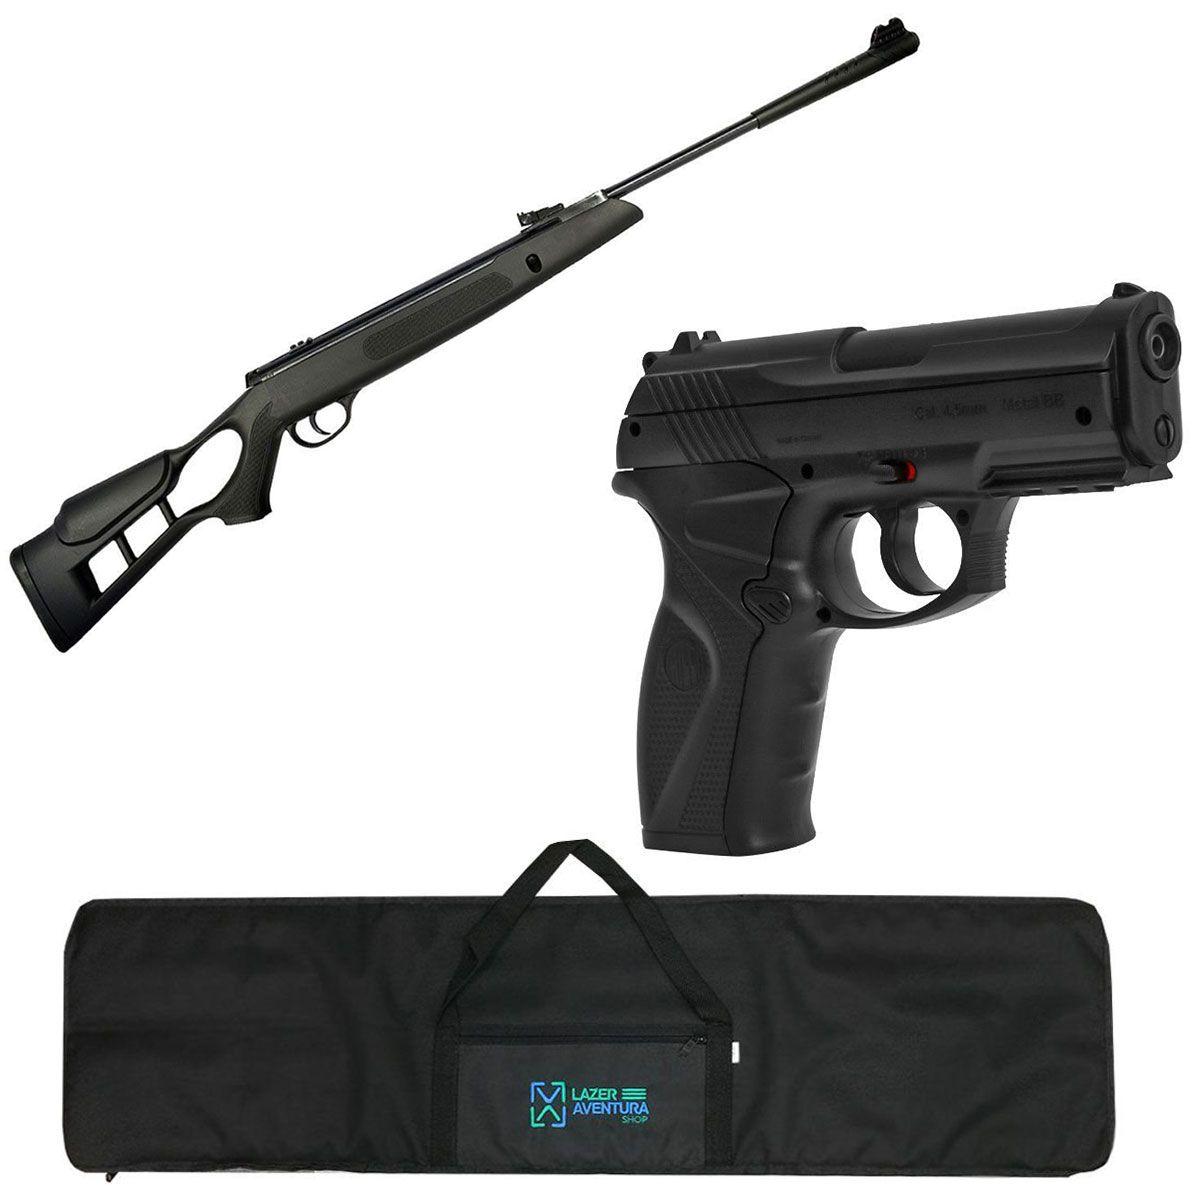 Kit Carabina 5,5mm + Pistola C11 + Capa Lazer e Aventura